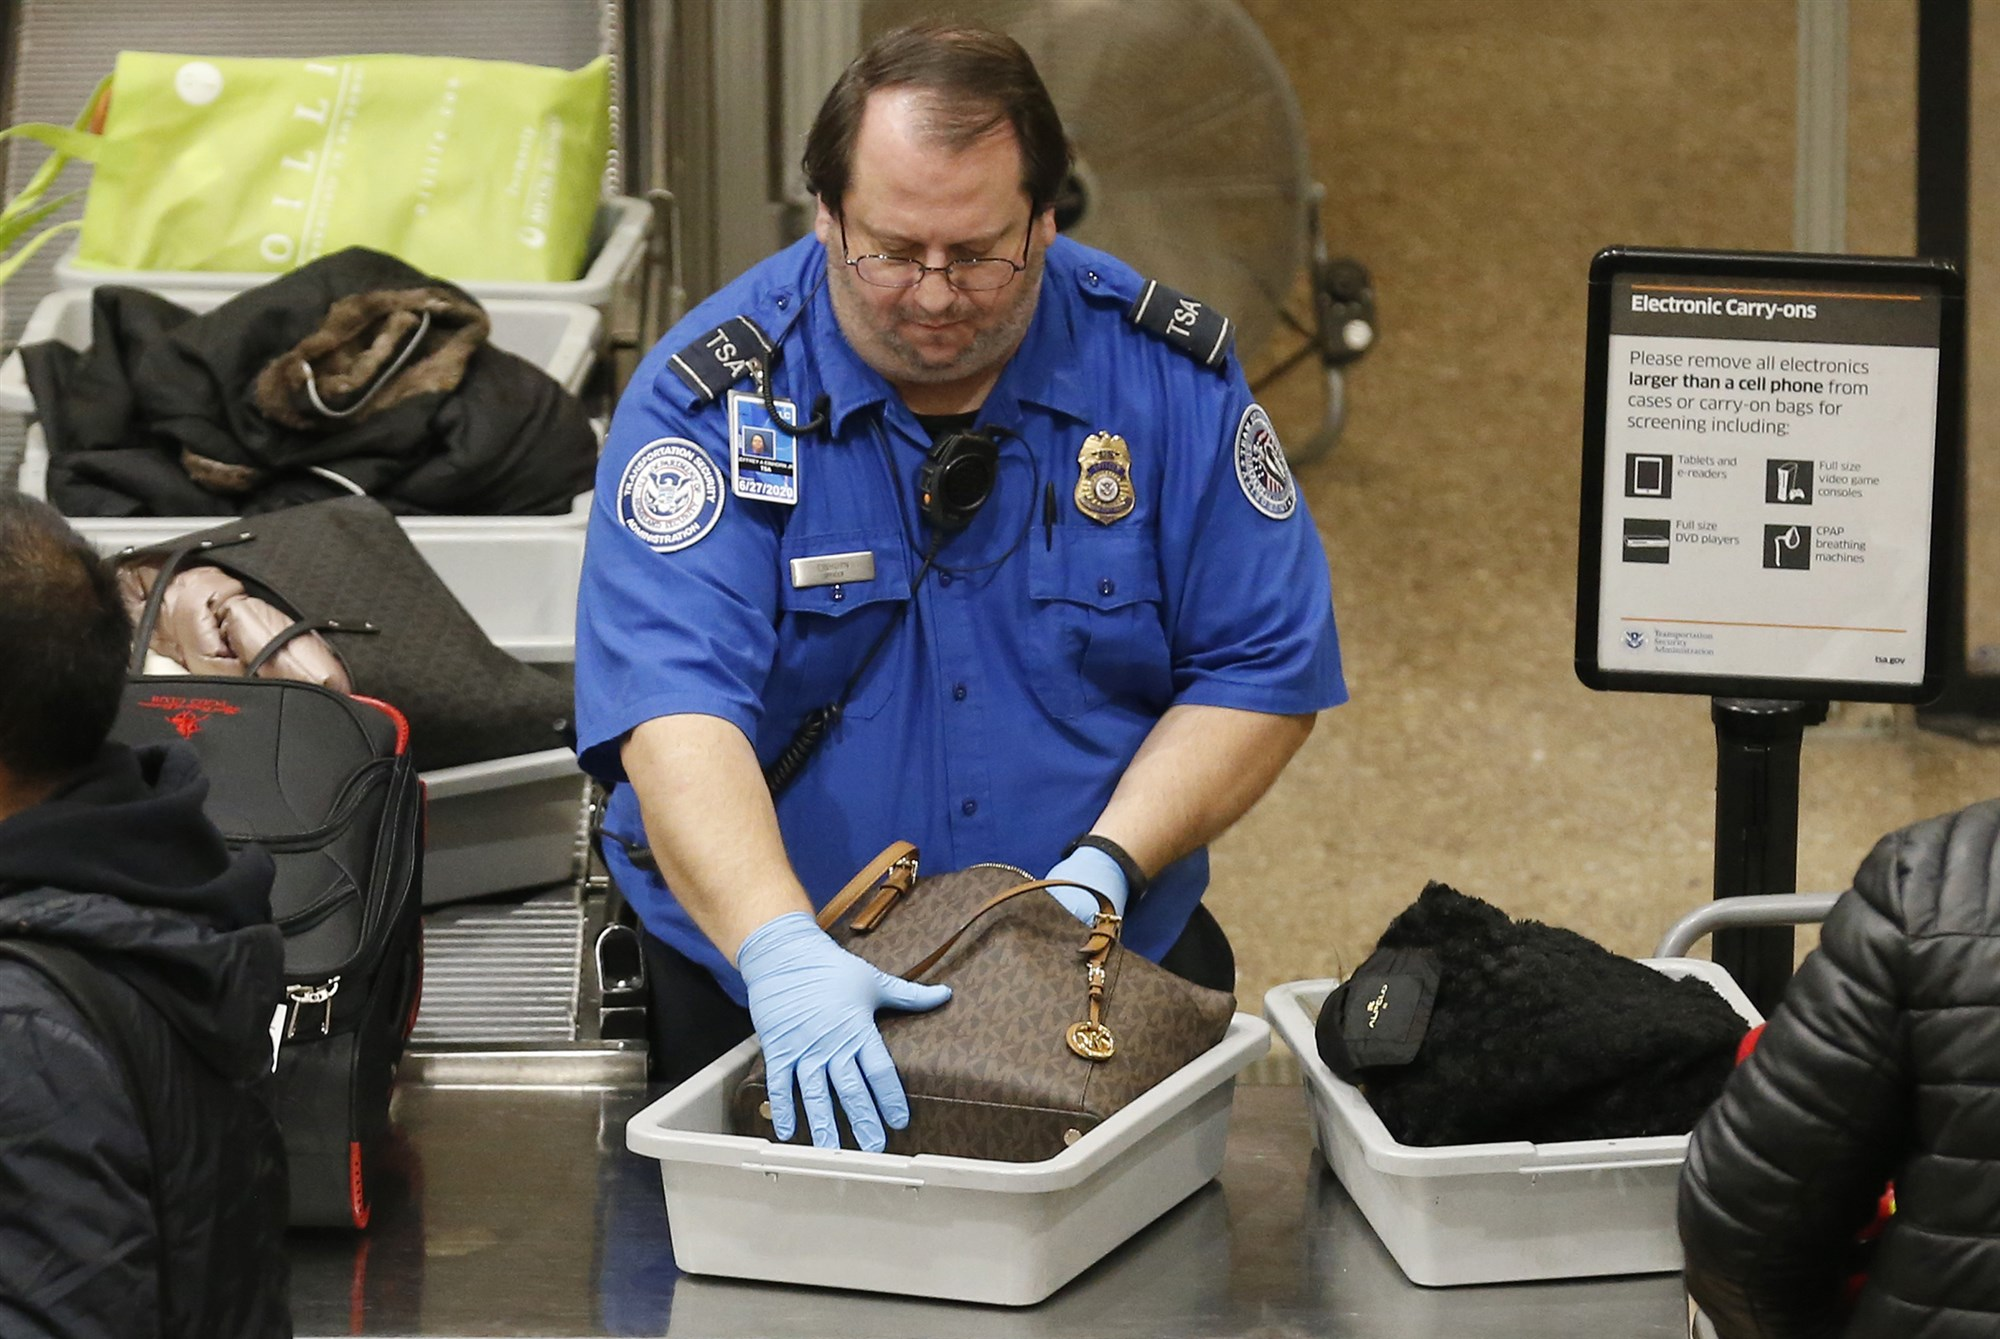 A TSA worker at the Salt Lake City International Airport on Jan. 16, 2019.Rick Bowmer / AP file